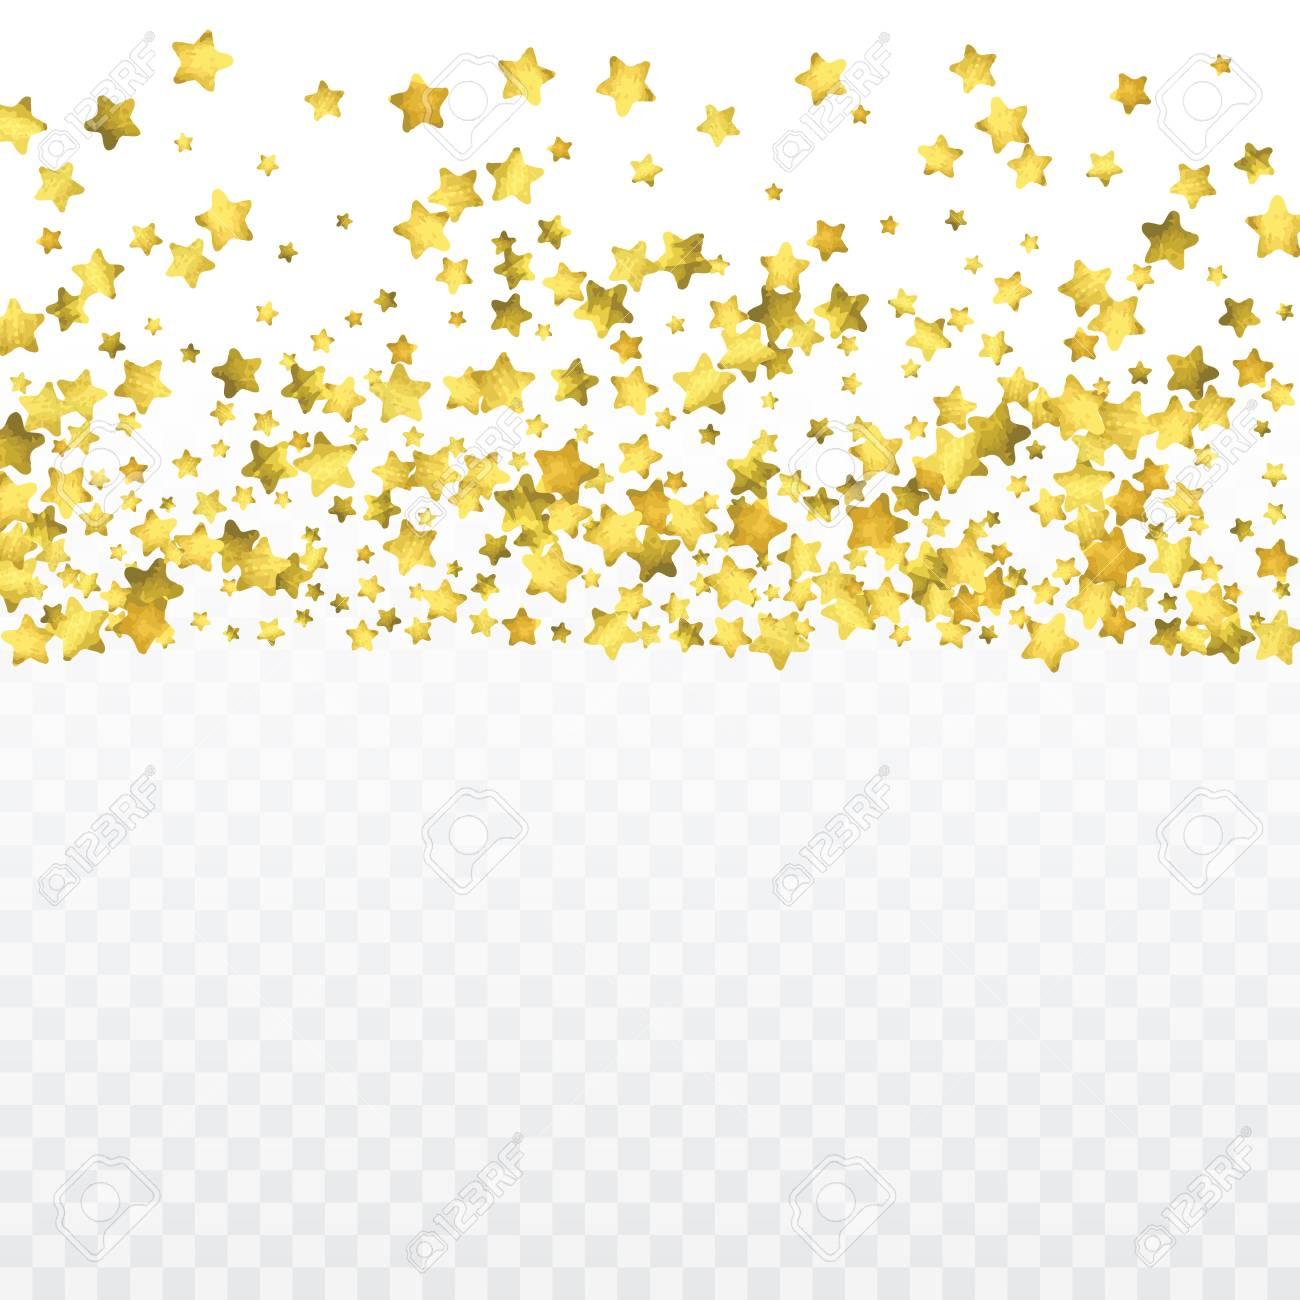 Round Gold Confetti Glow Vector Celebrate Background Golden